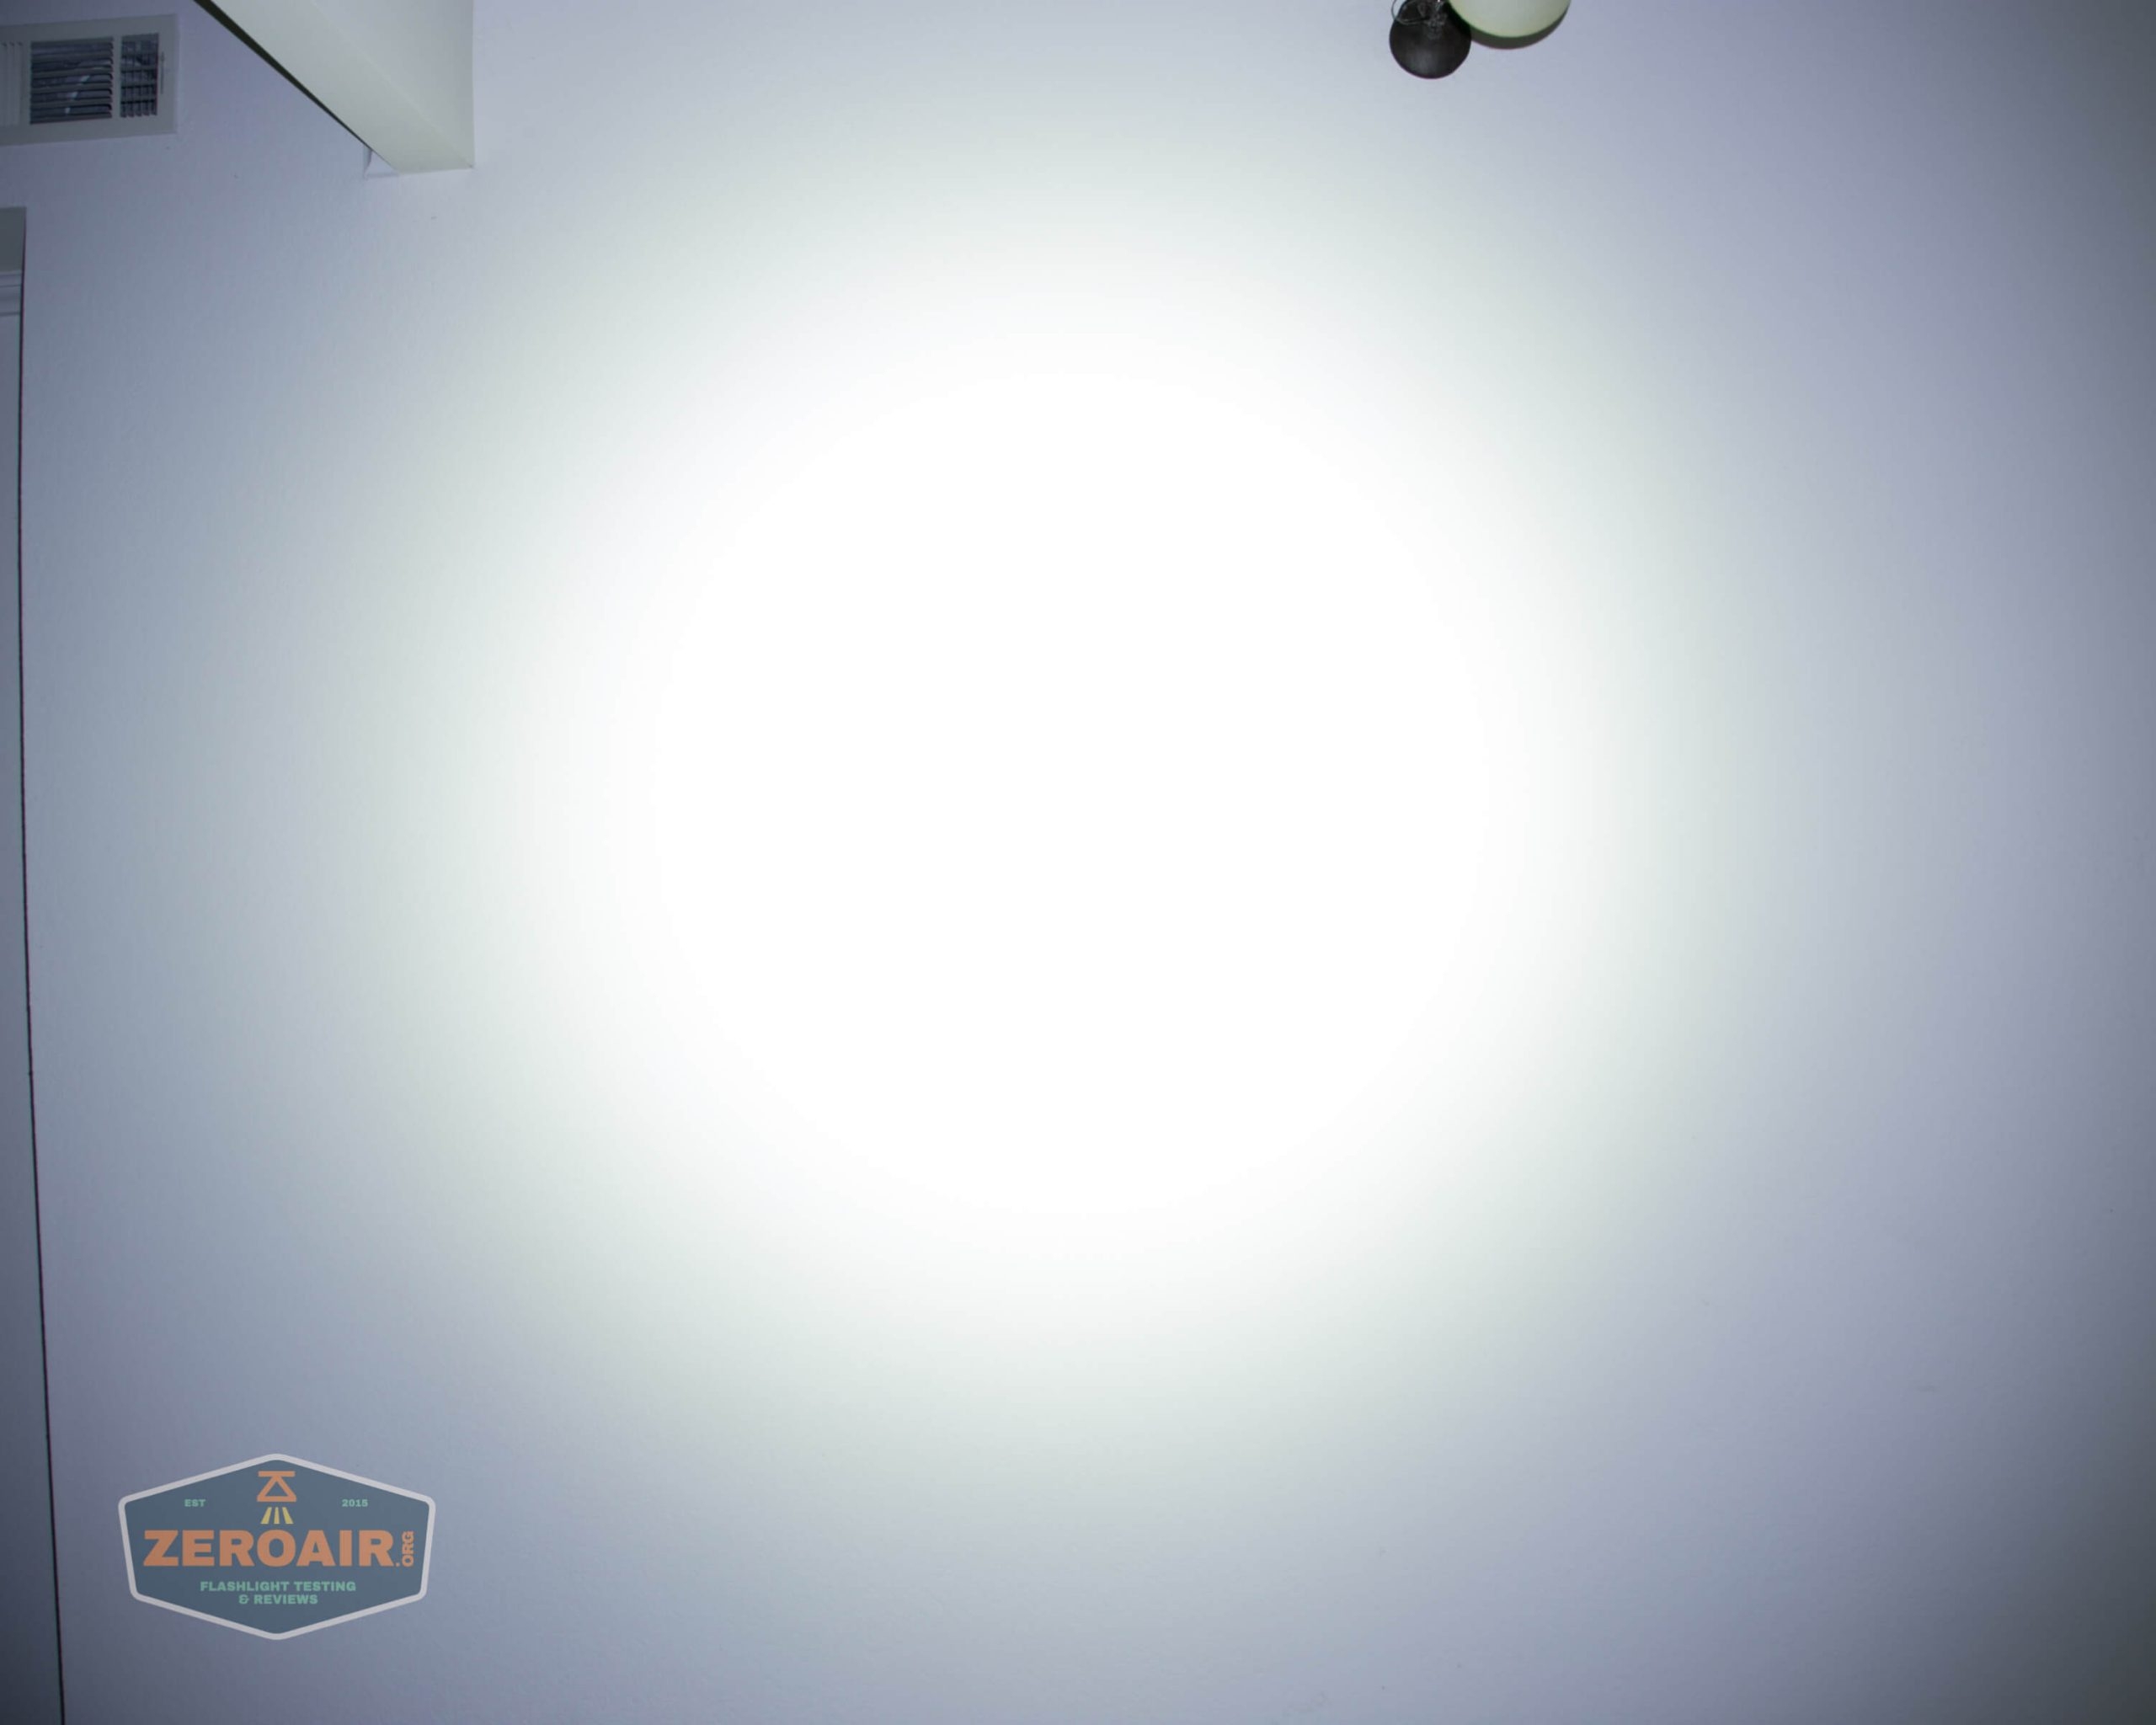 klarus g25 21700 cree xhp70.2 flashlight beamshot ceiling highest